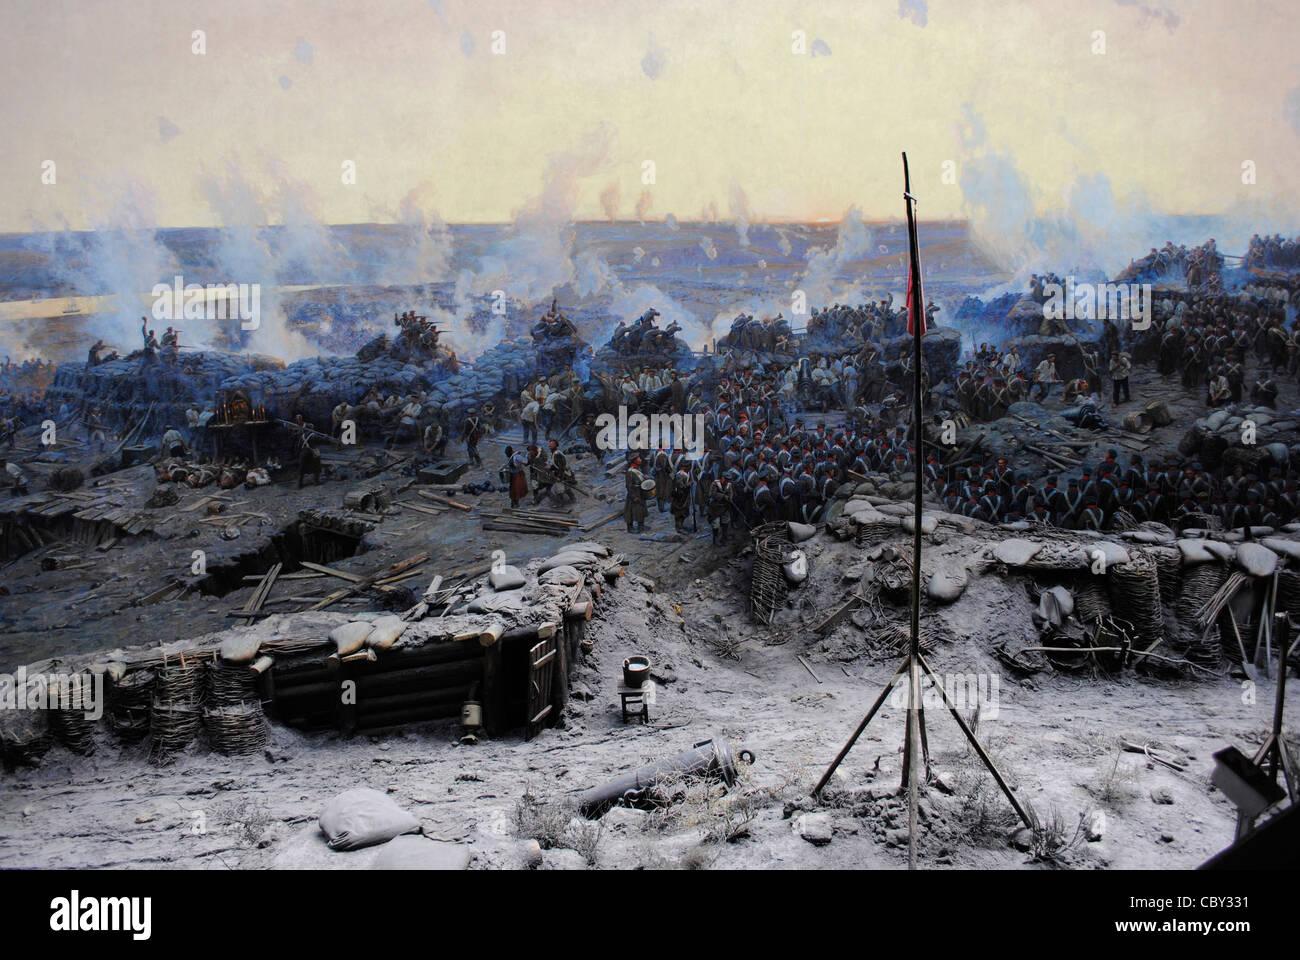 Crimean War (1853-1856). Siege of Sevastopol, 1854-1855, by Franz Alekseyevich Roubaud (1856-1928). Crimean Peninsula. - Stock Image